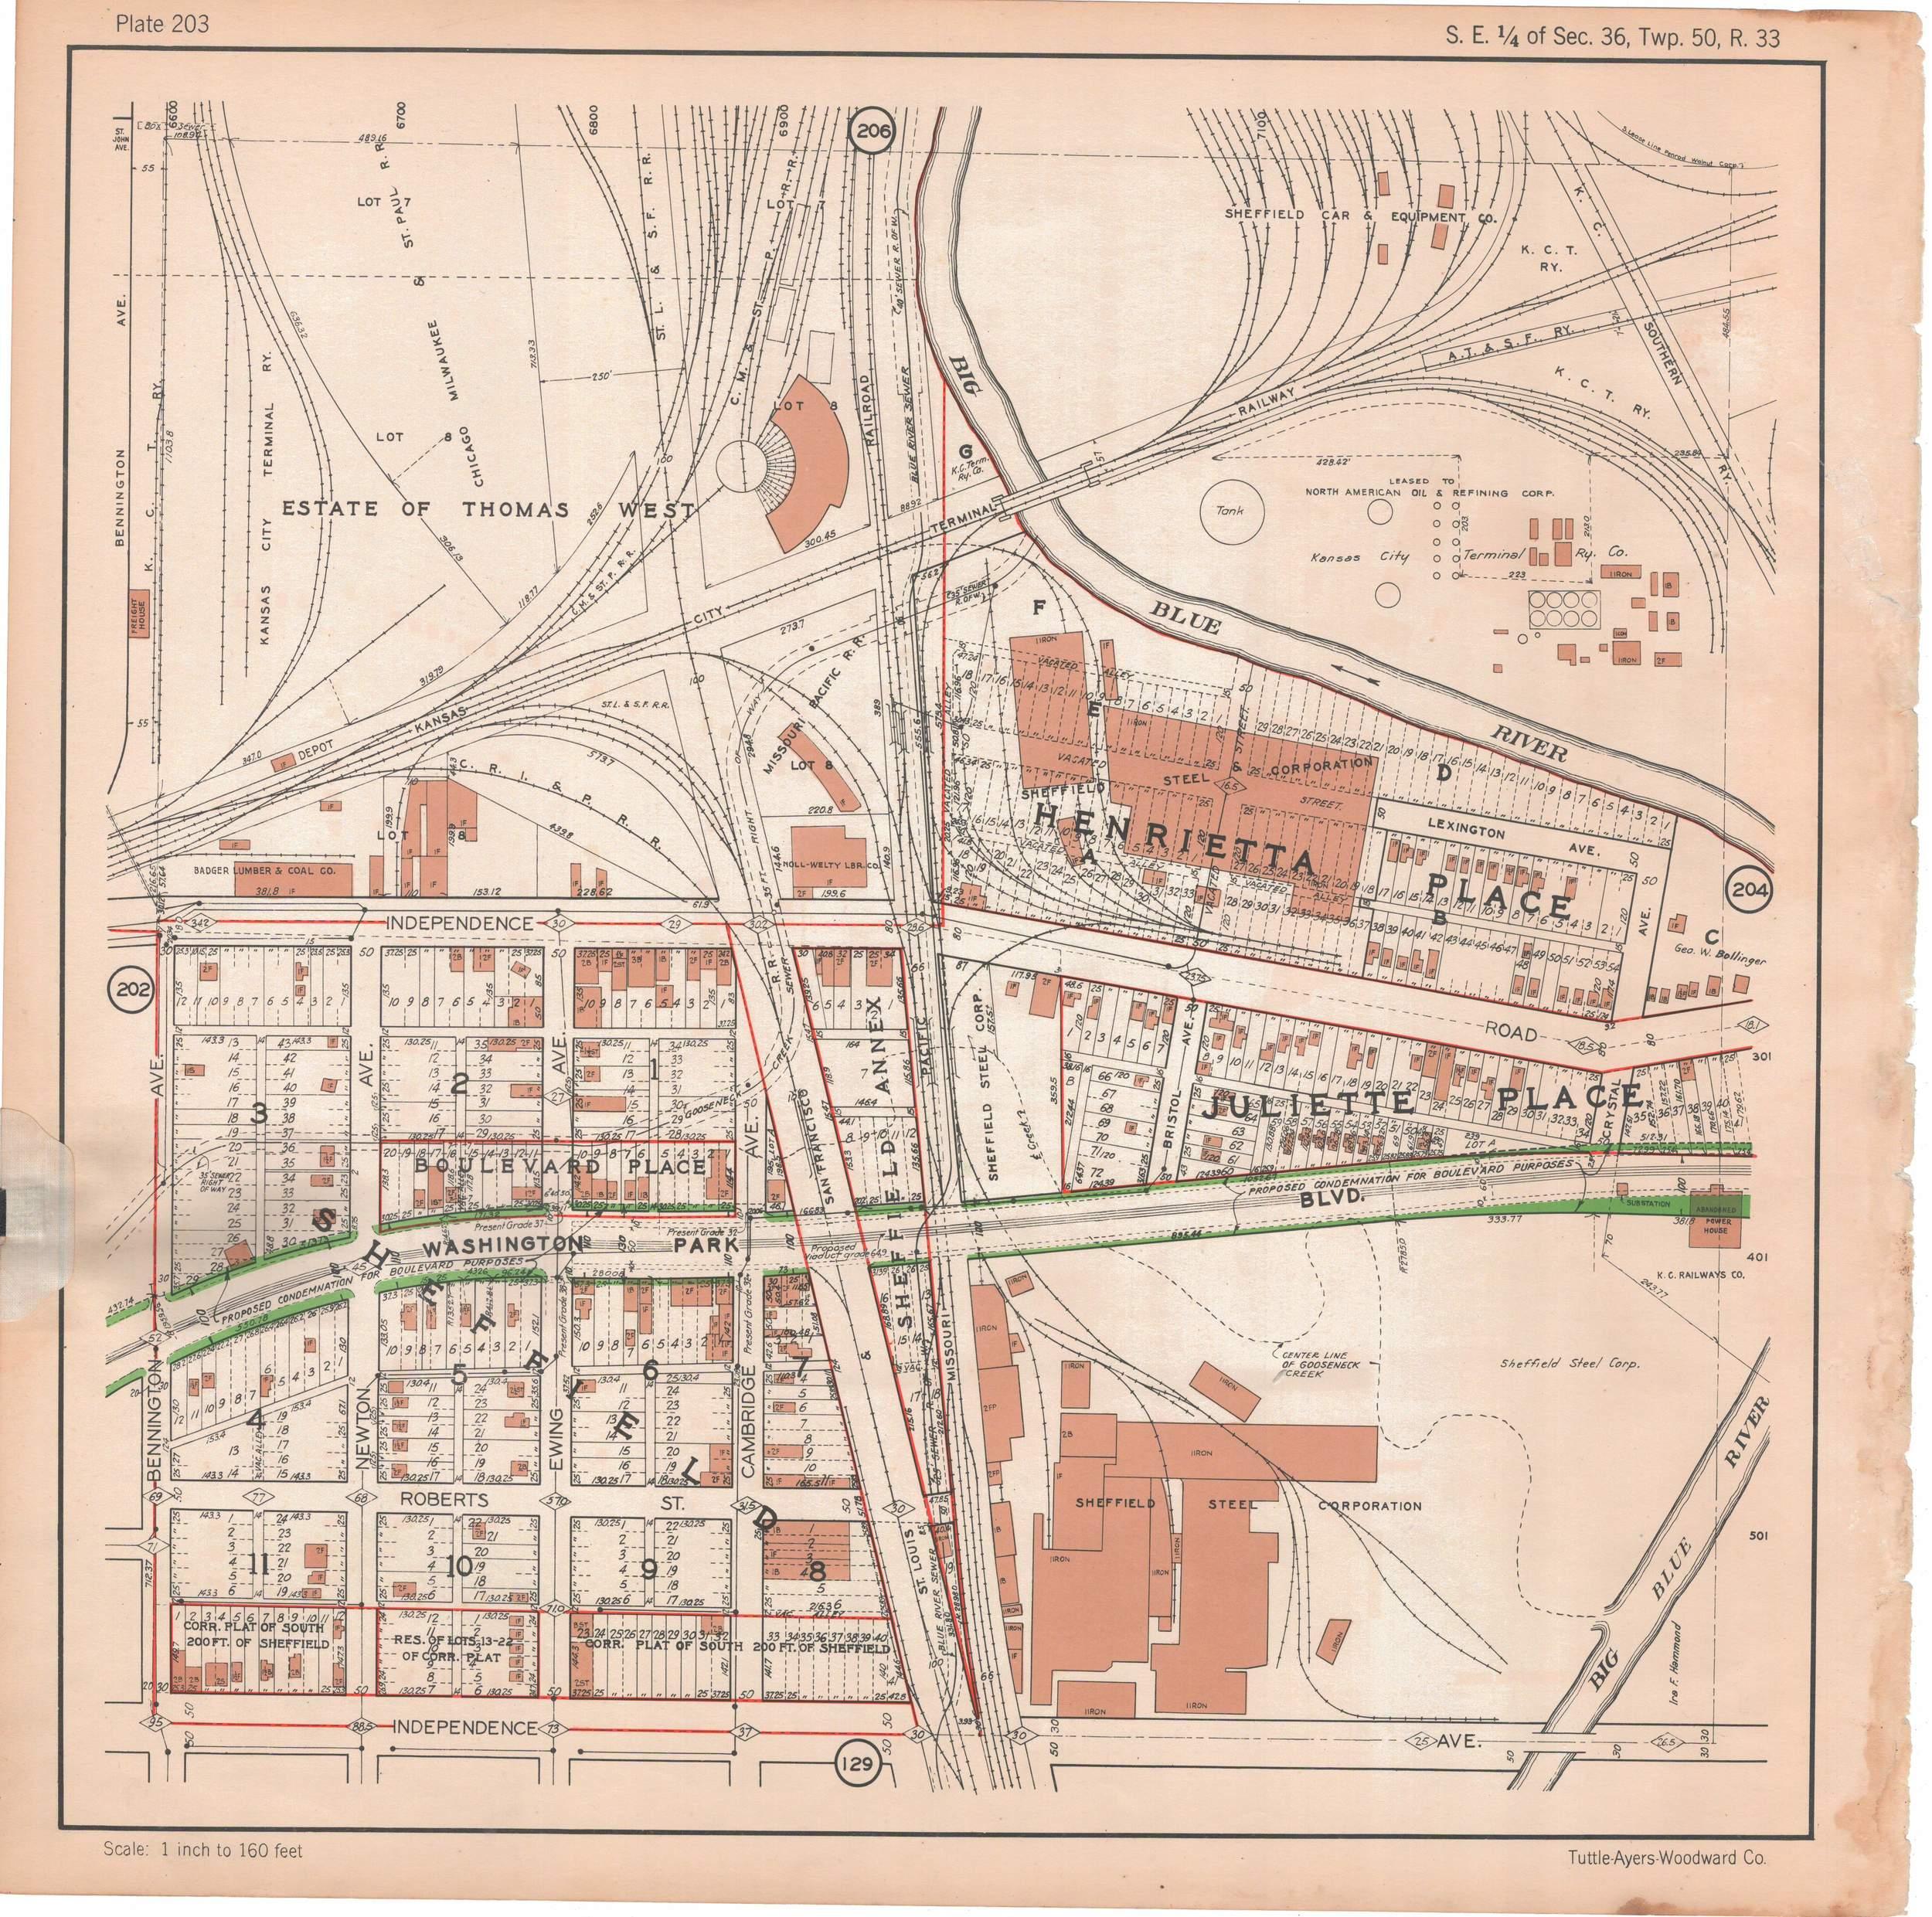 1925 TUTTLE_AYERS_Plate_203.JPG